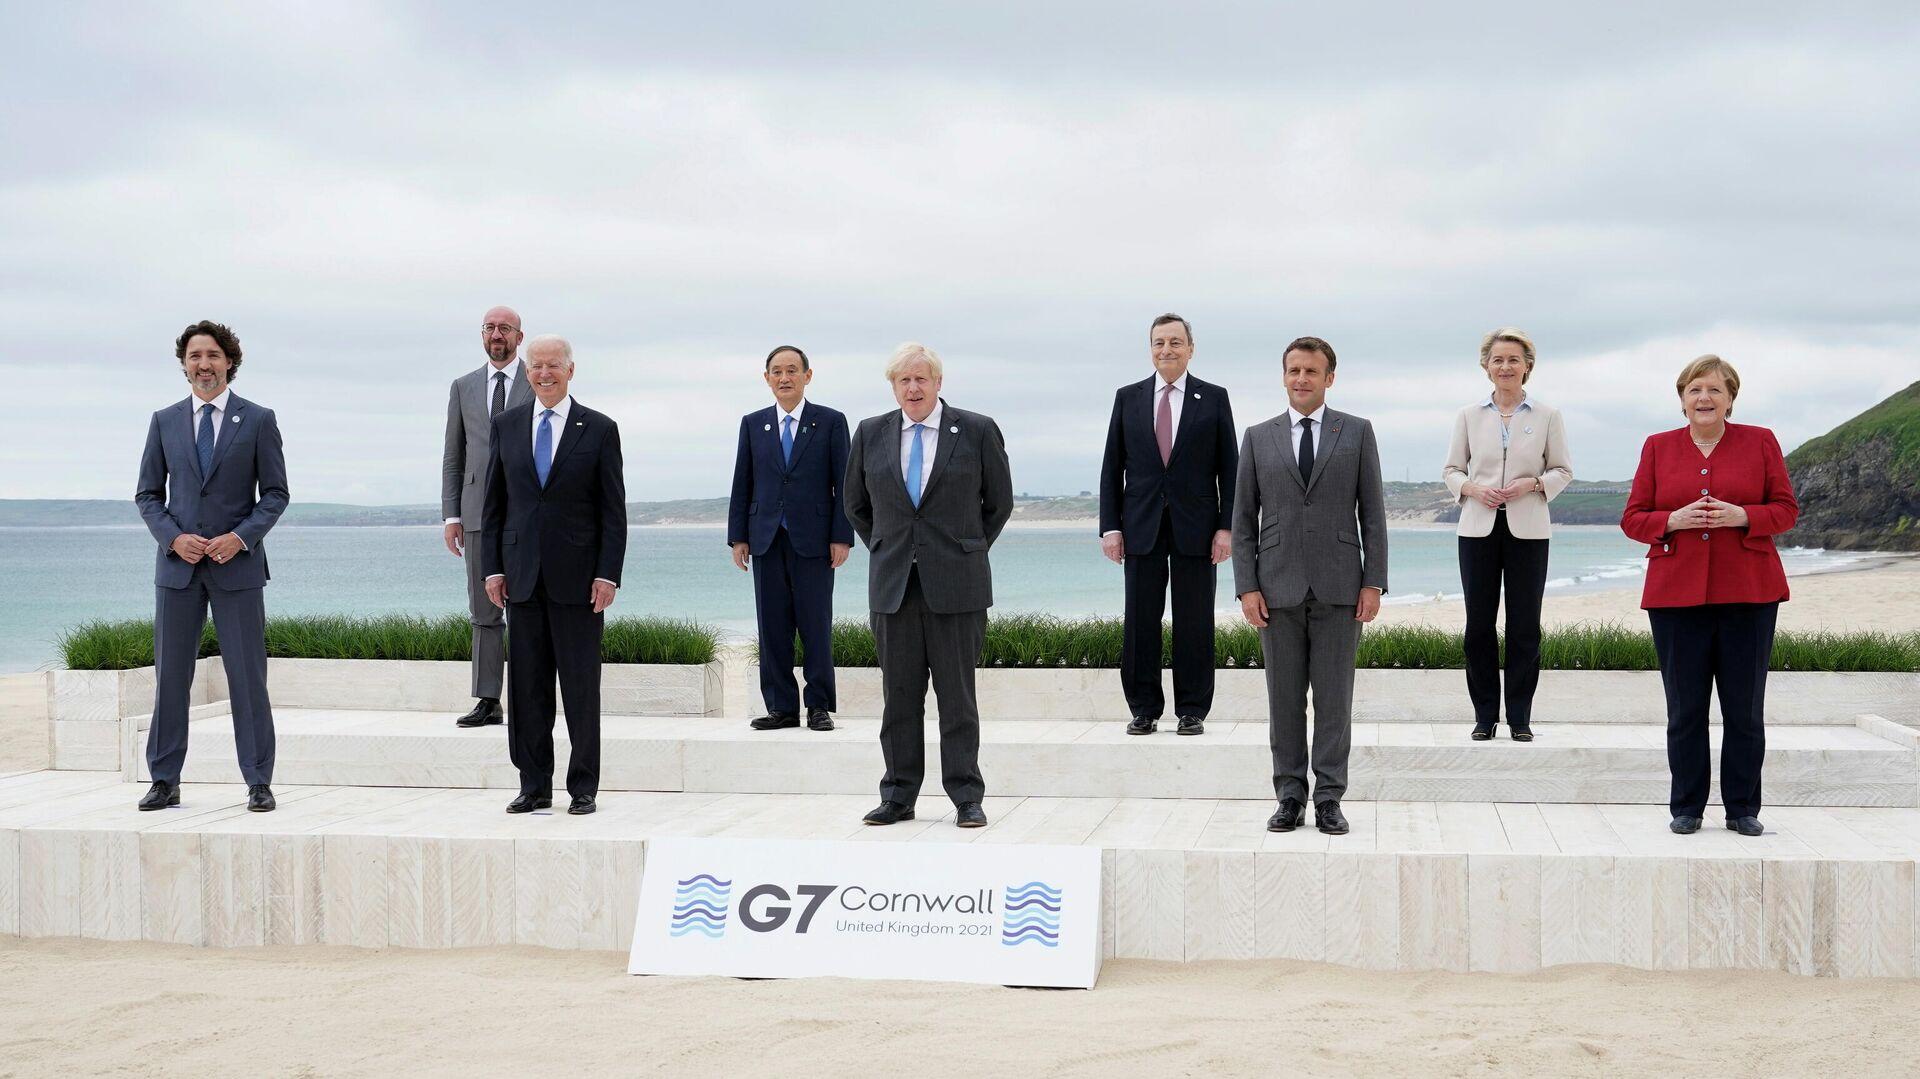 Участники саммита G7 в Великобритании - РИА Новости, 1920, 15.06.2021